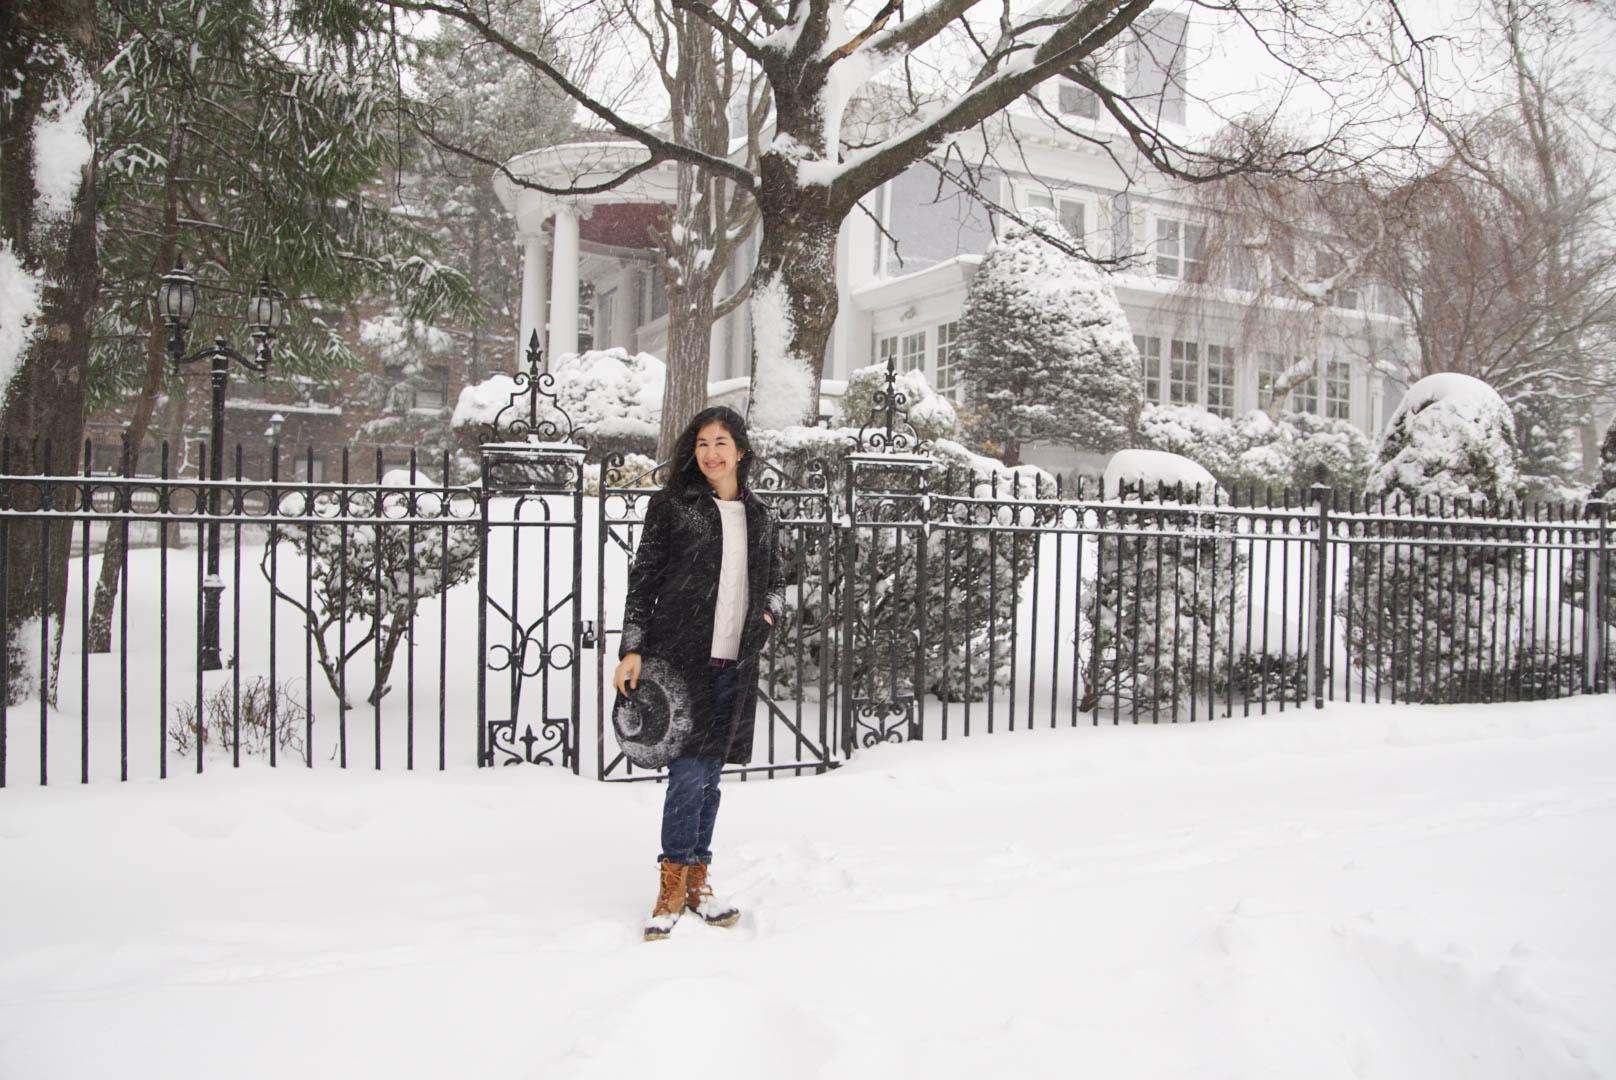 Wnter Storm Jonas Brooklyn New York Ralph Lauren Plaid Shirt LL bean Boots Levis 501 Jeans Brooks Brothers Jacket LL Bean Sweater